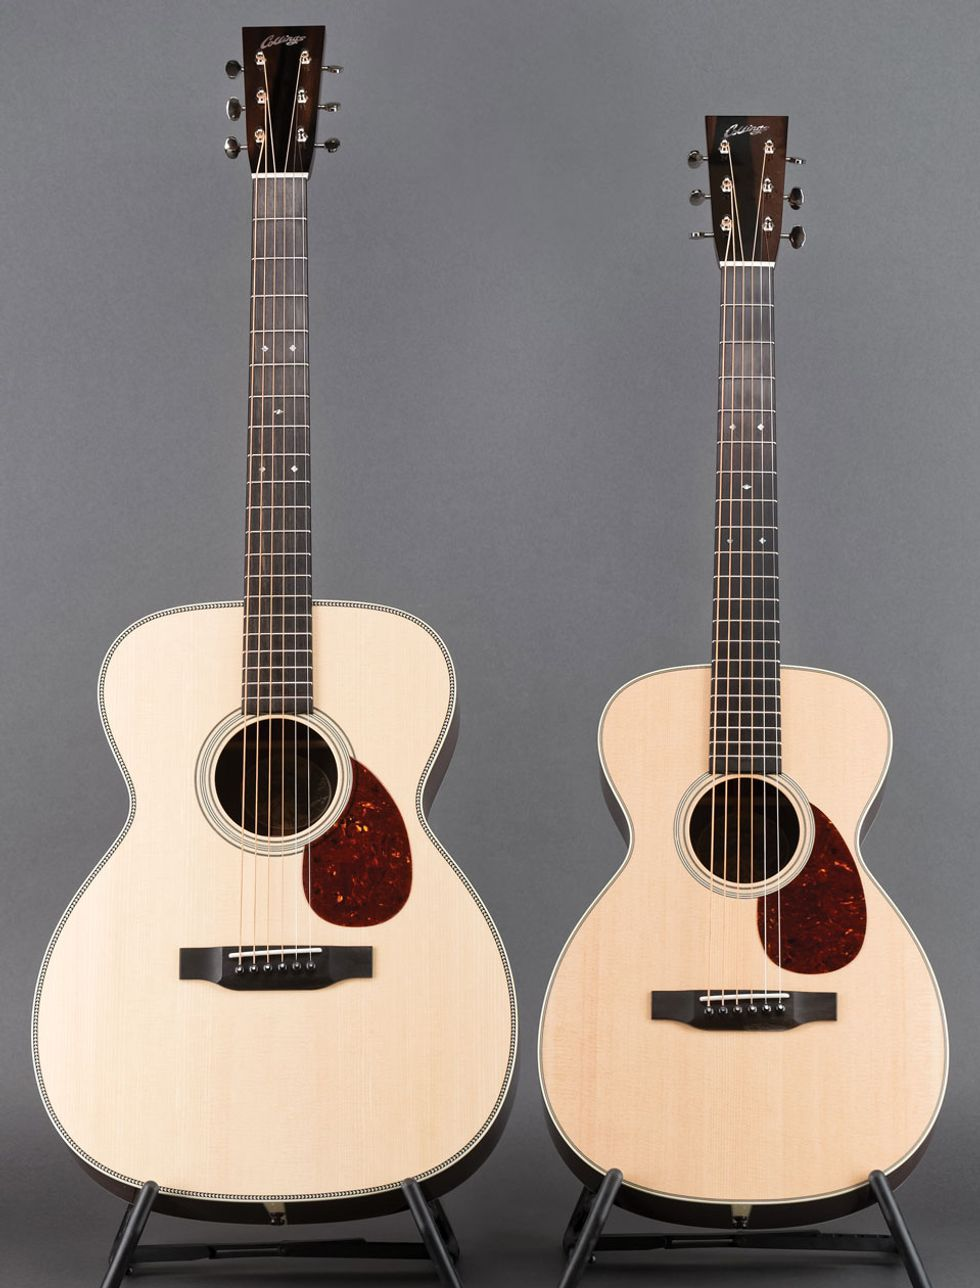 Acoustic Soundboard: Honey, I Shrunk the Guitar | Premier Guitar